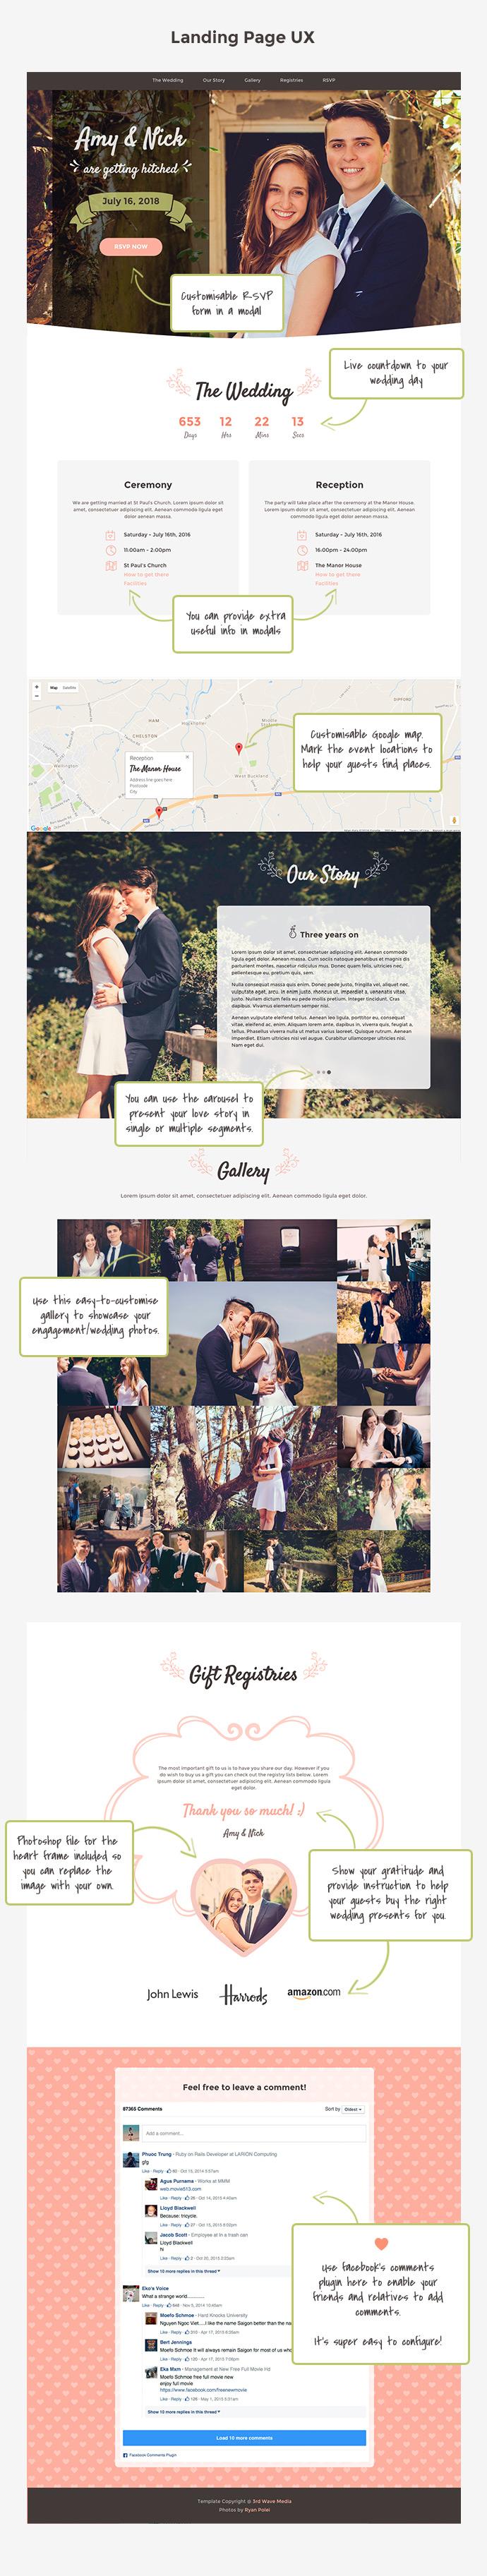 matrimony-promo-with-ux-notes